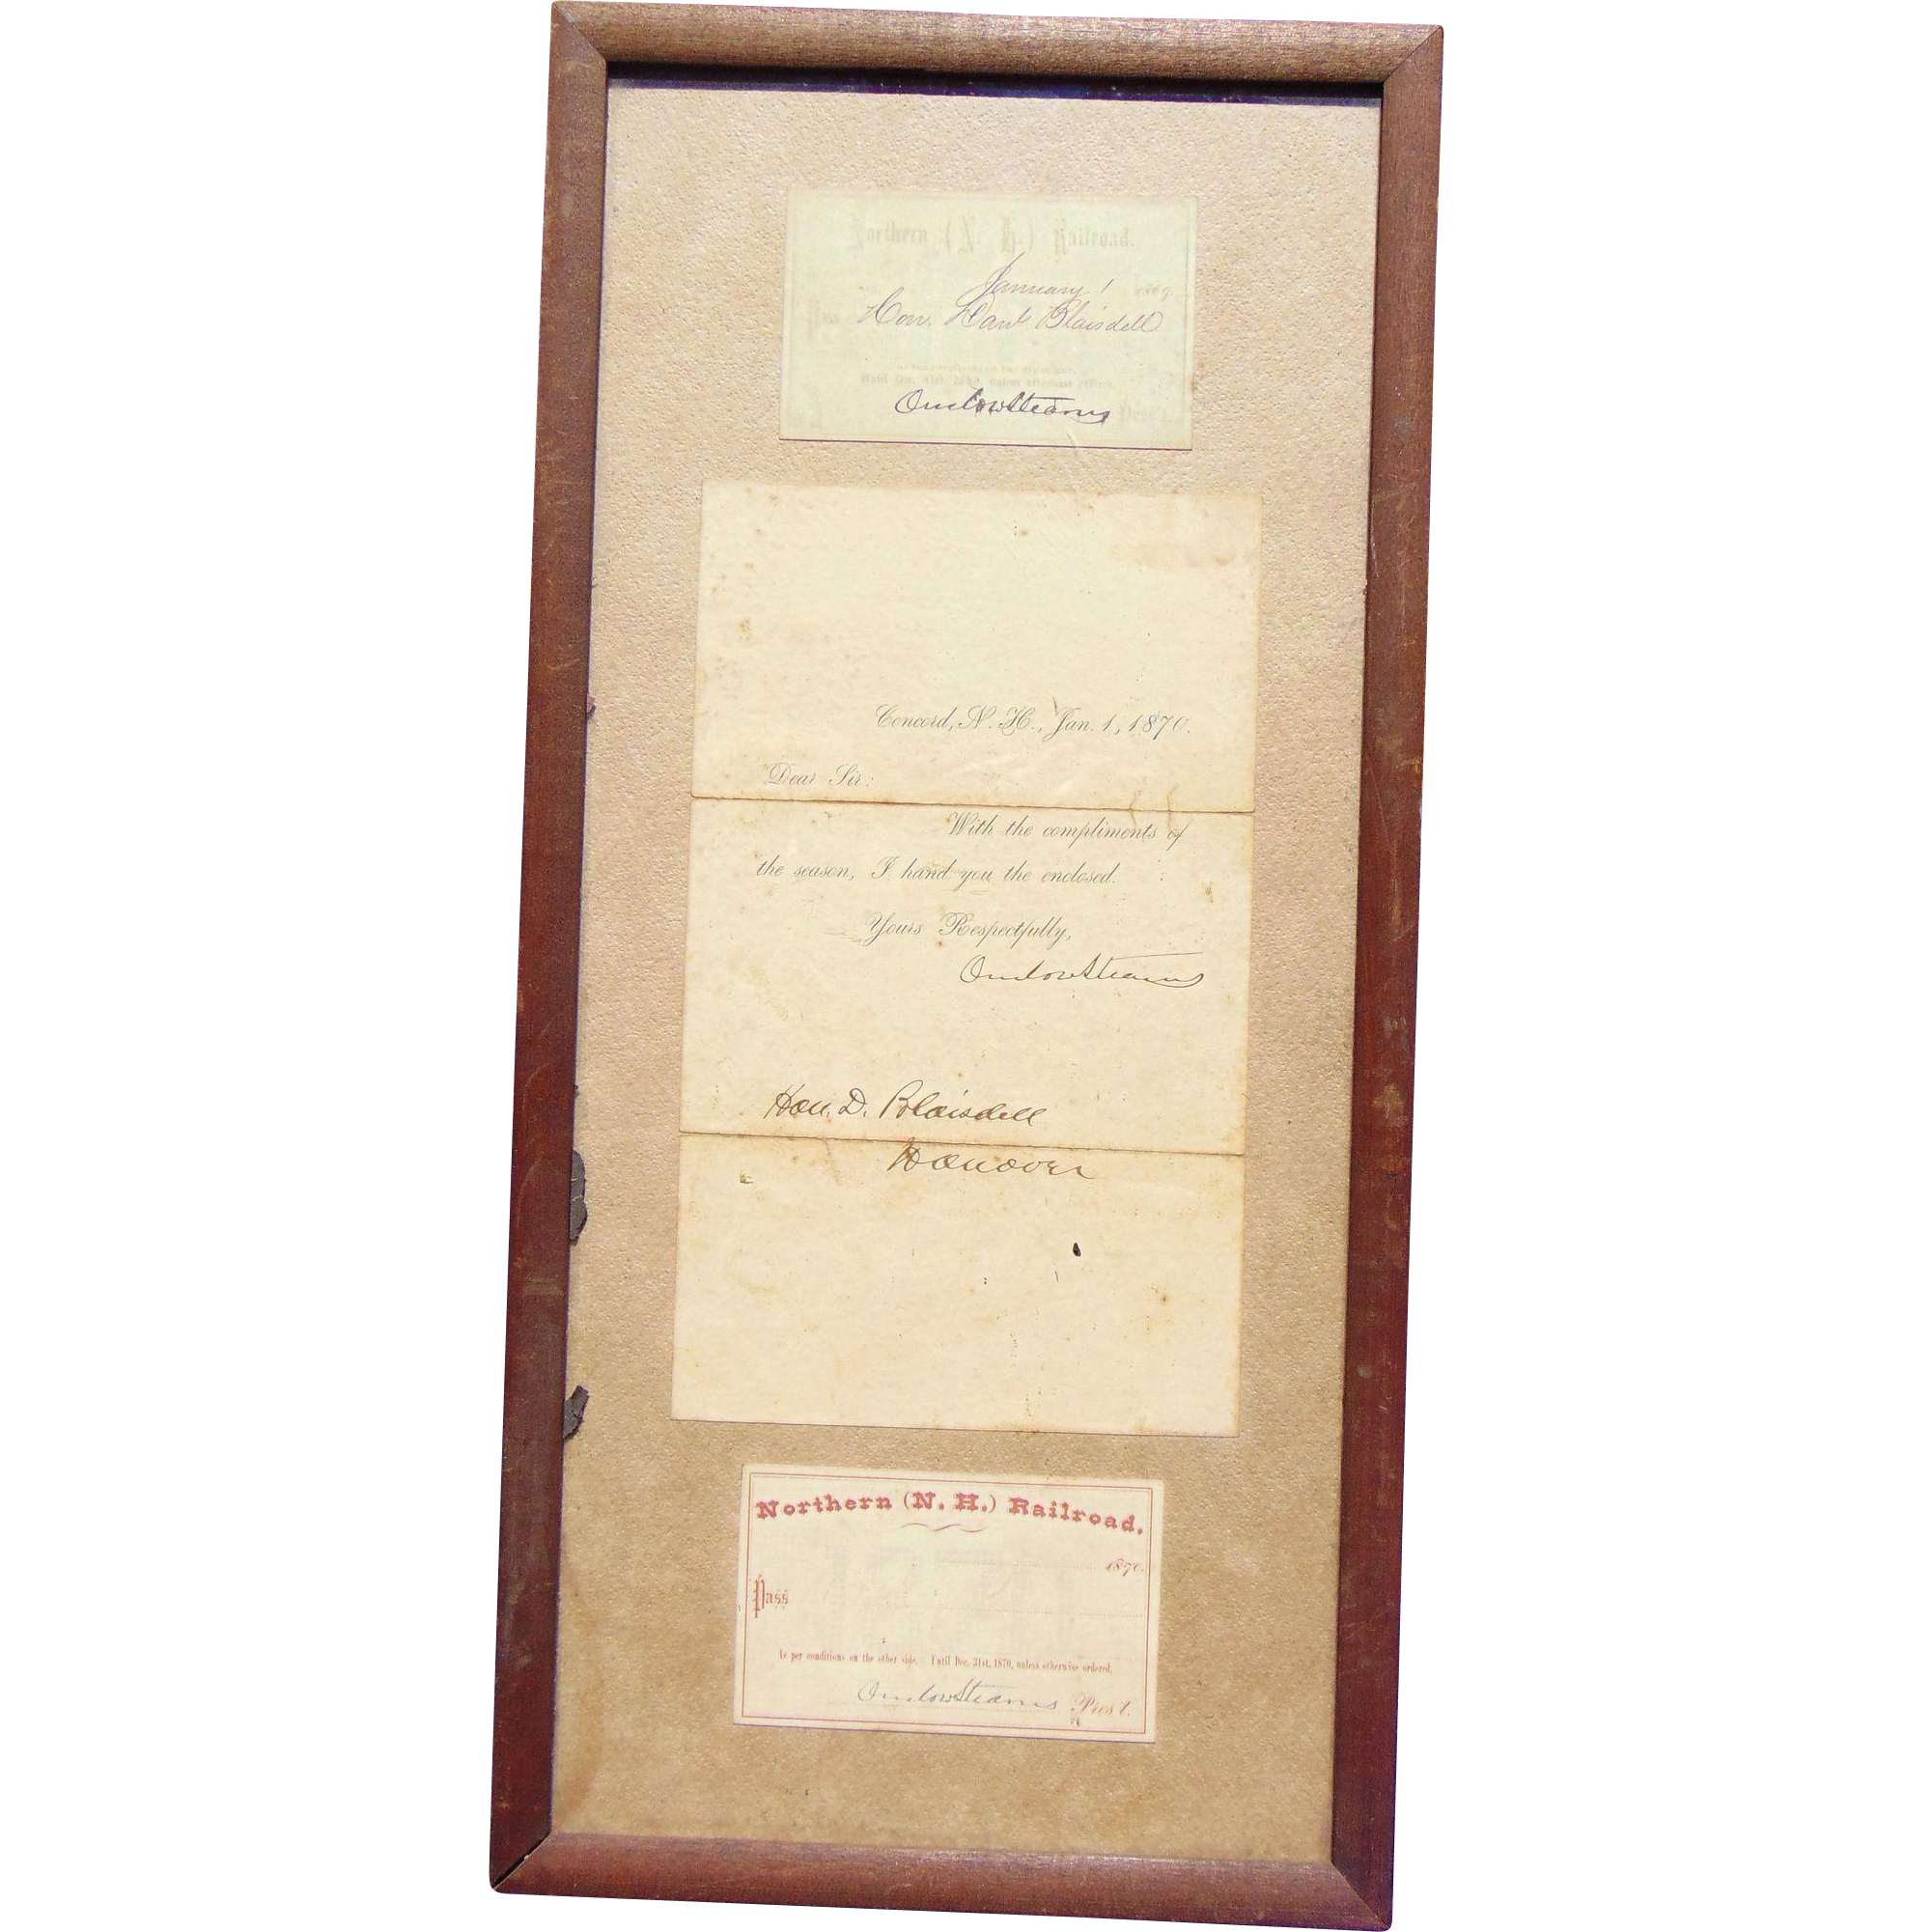 1869 & 1870 Northern New Hampshire Railroad Passes for Daniel Blasidell